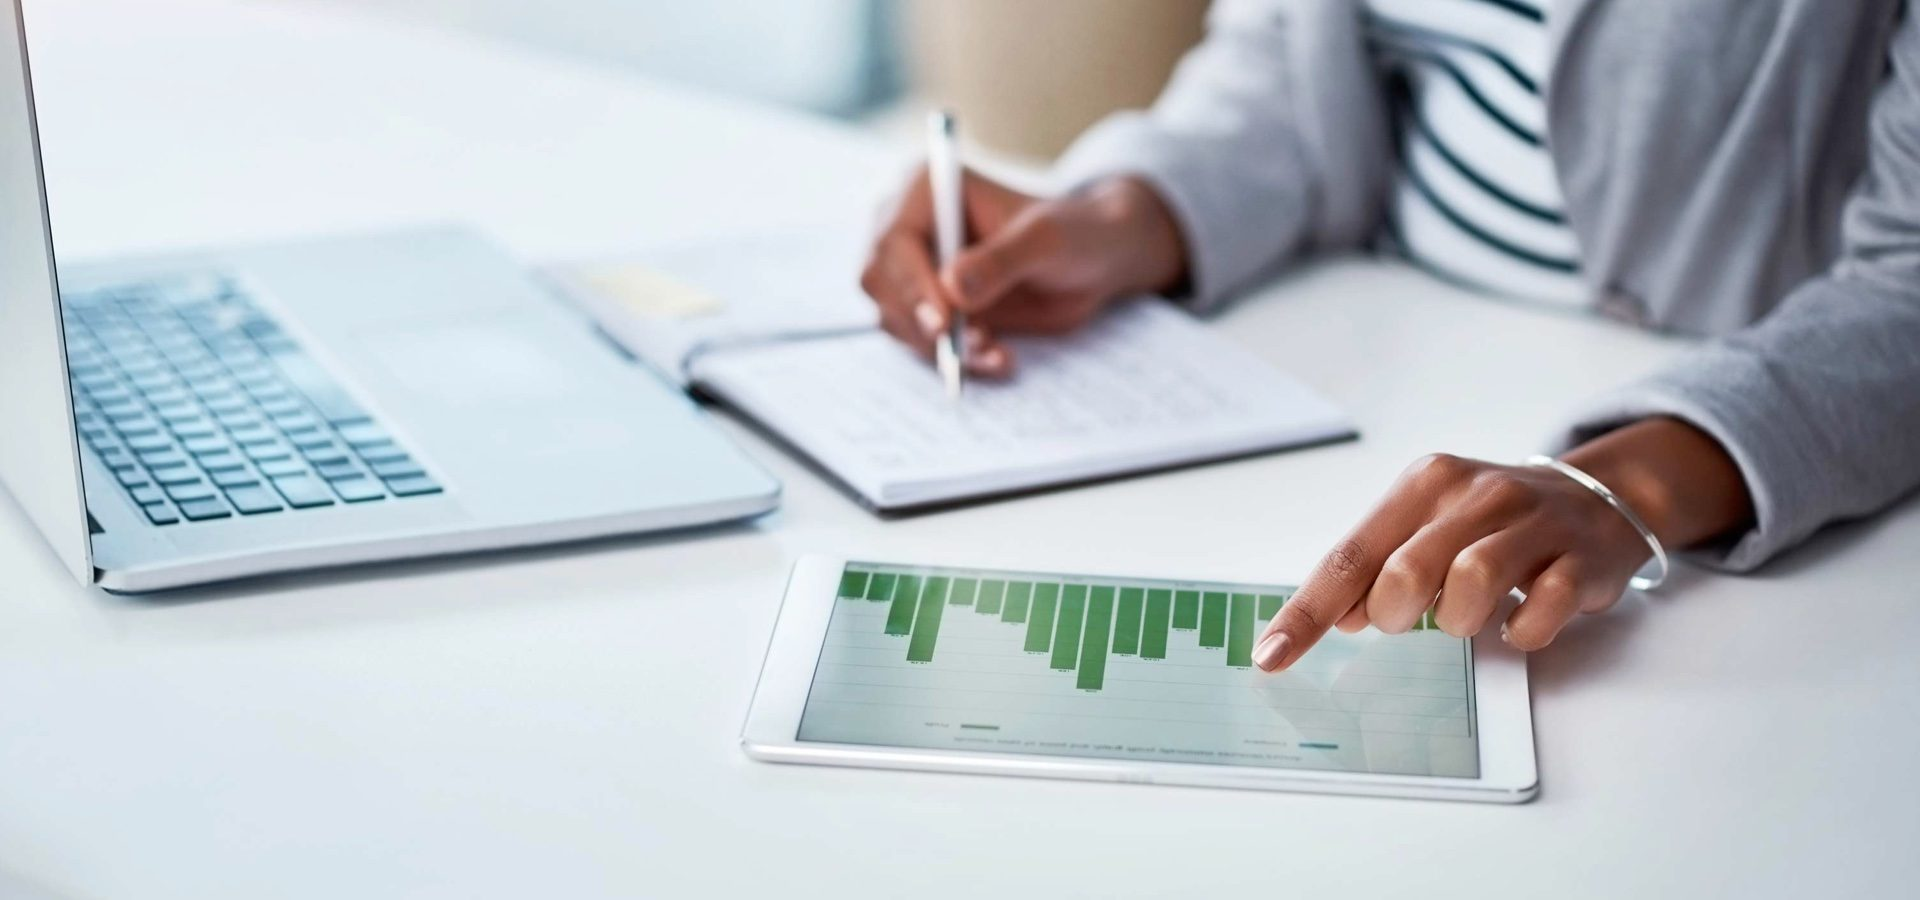 Media monitoring best practice: 5 key considerations